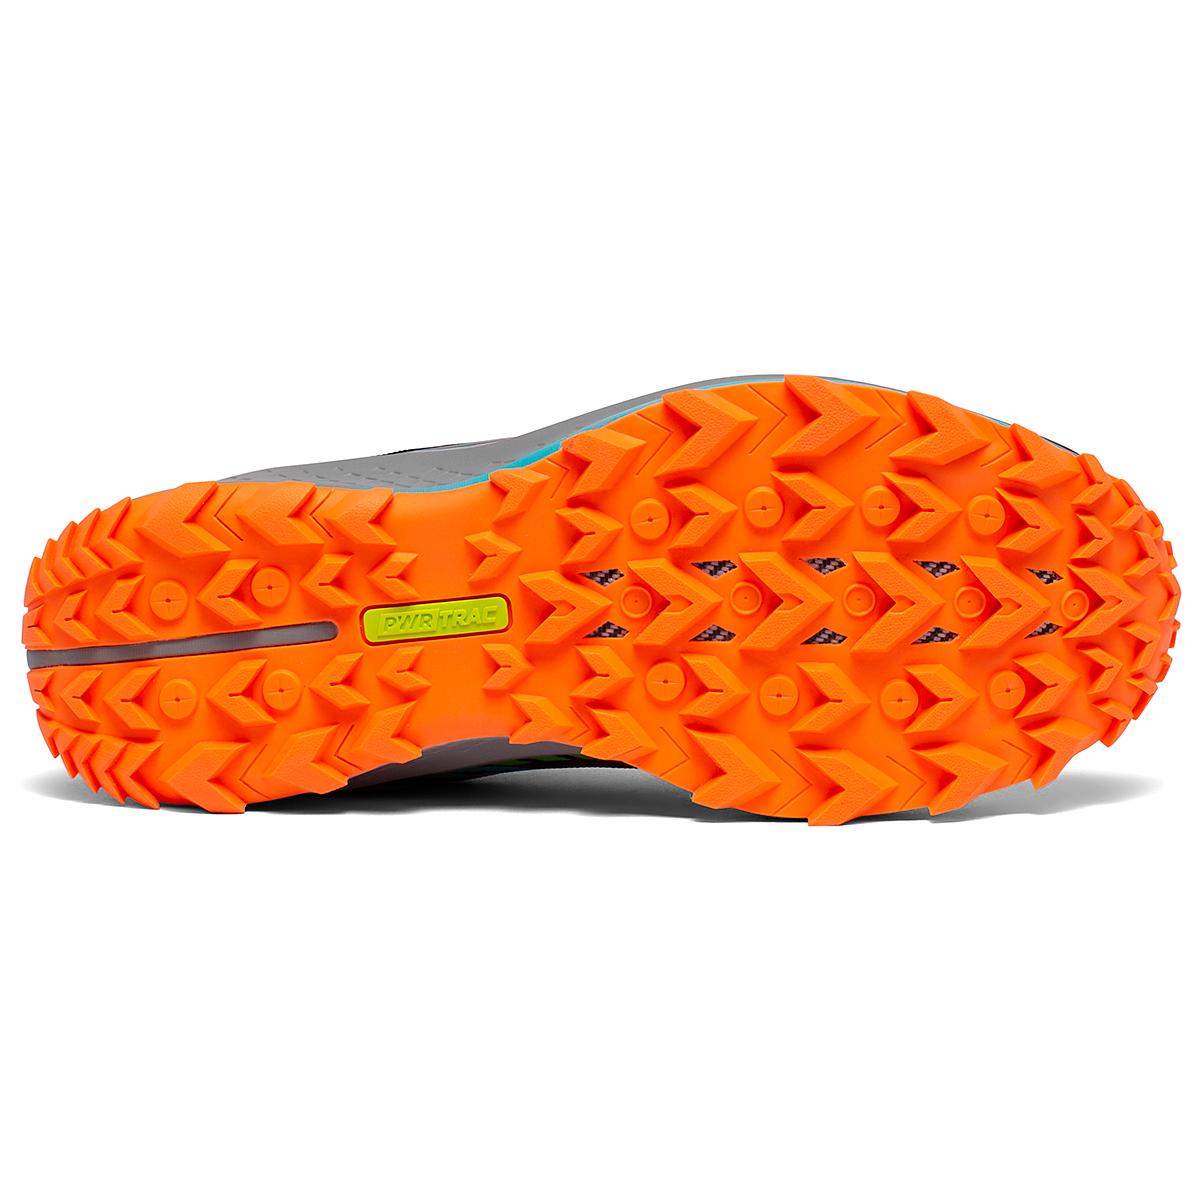 Men's Saucony Peregrine 11 Trail Running Shoe - Color: Future/Black - Size: 8 - Width: Regular, Future/Black, large, image 5